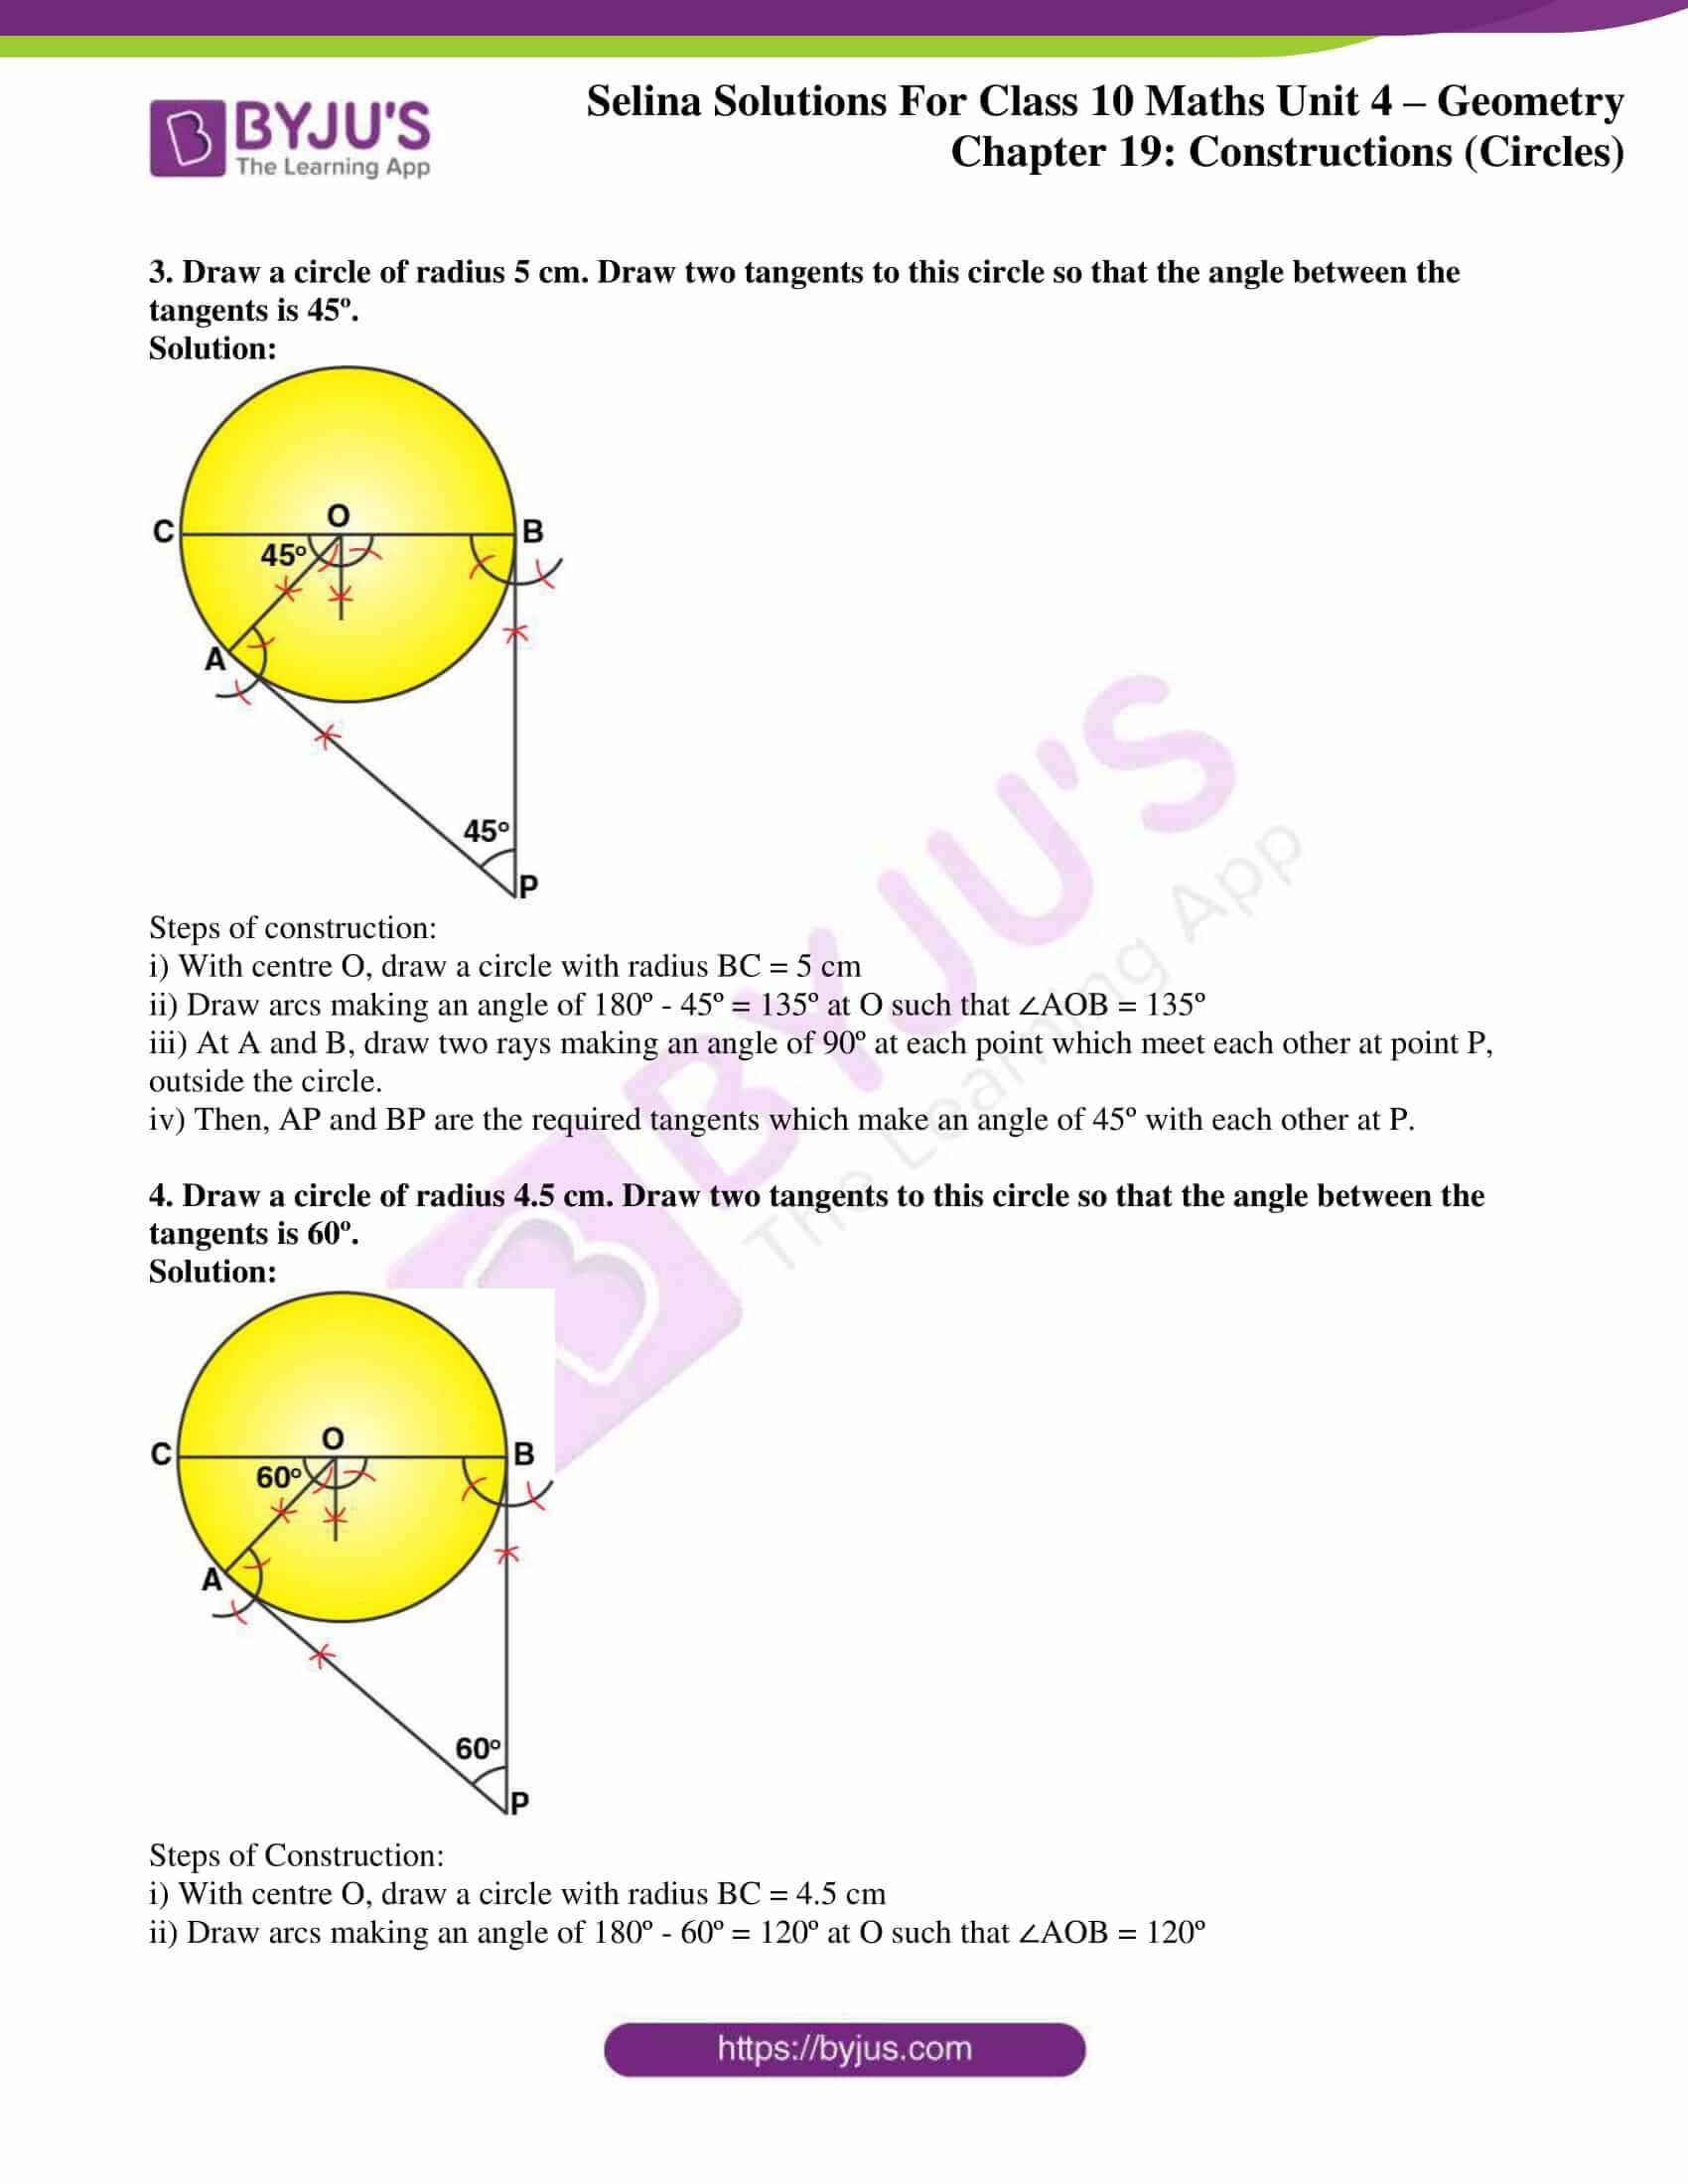 selina-sol-maths-class-10-ch-19-2